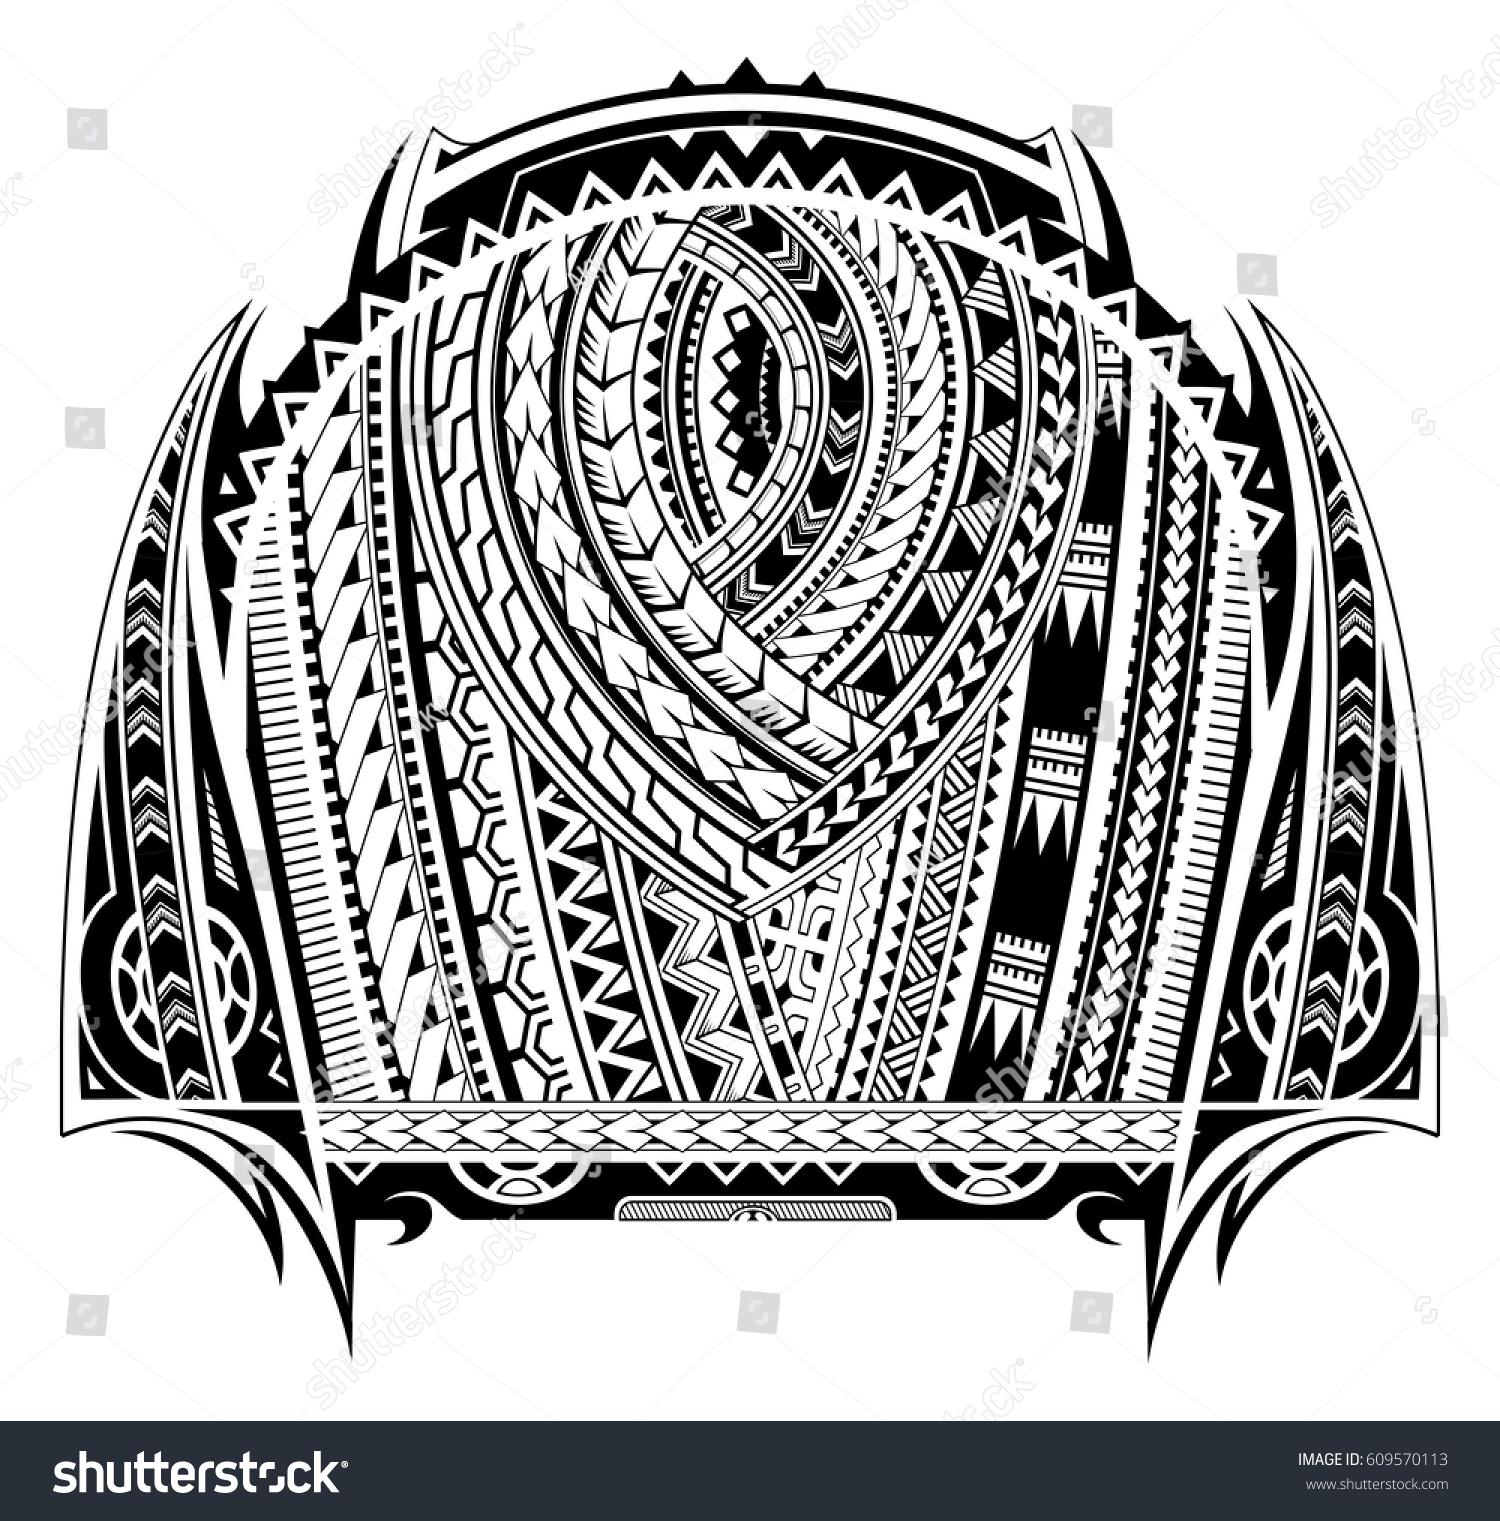 Maori style tattoo good chest sleeve stock vector for Vector tattoo sleeve